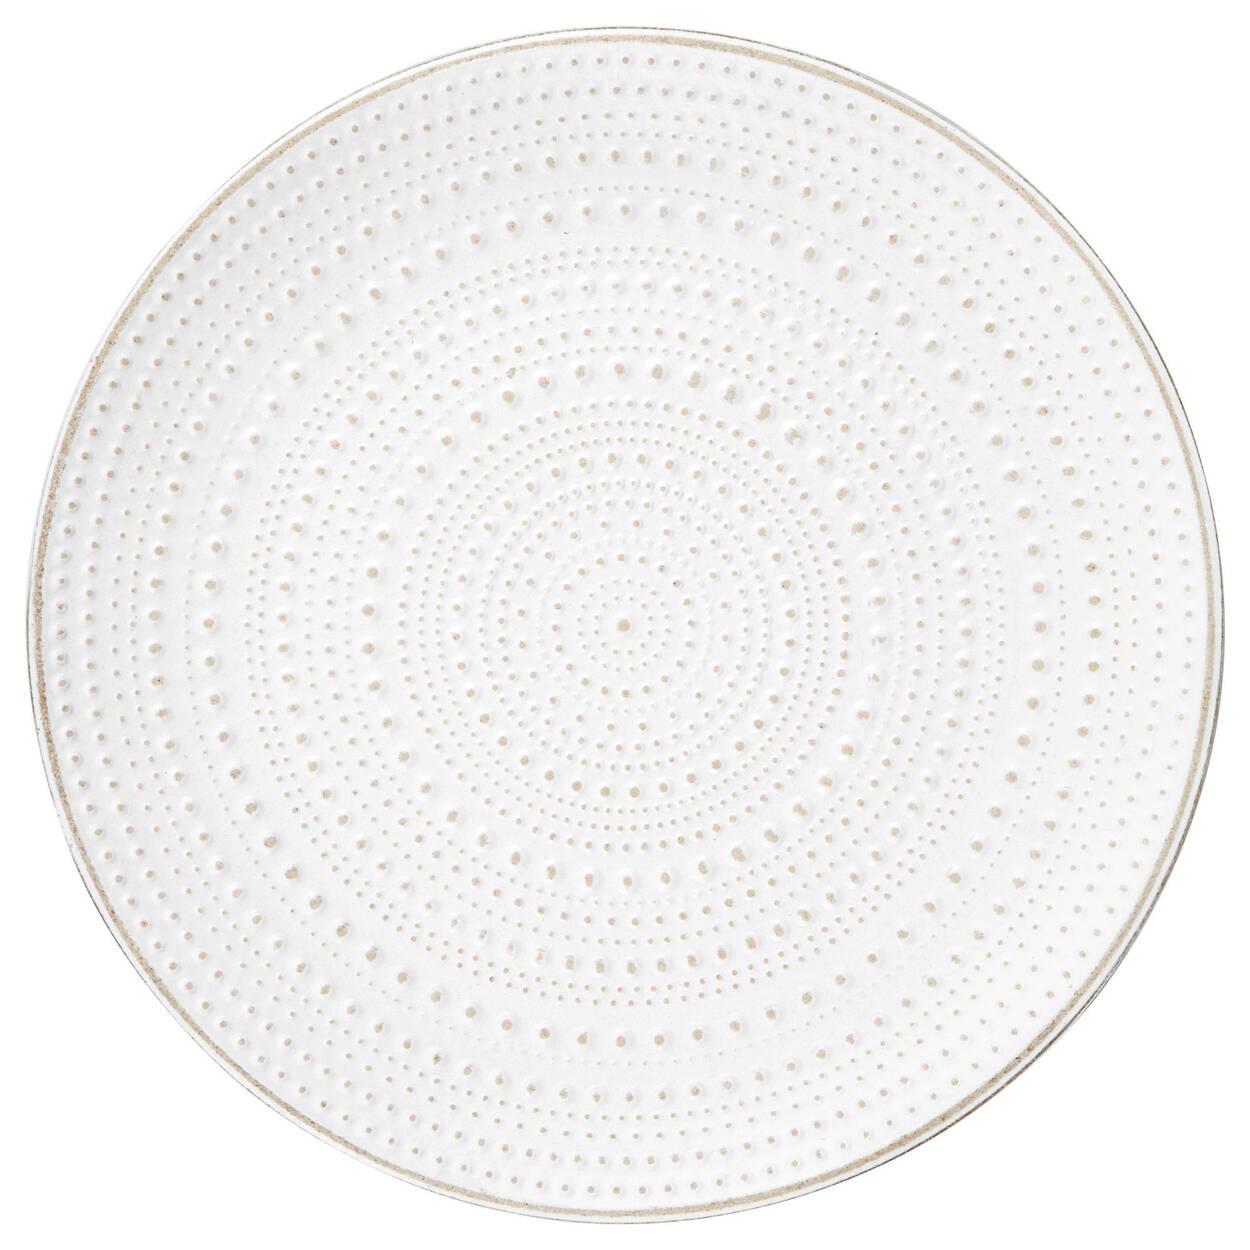 Decorative Textured Plate